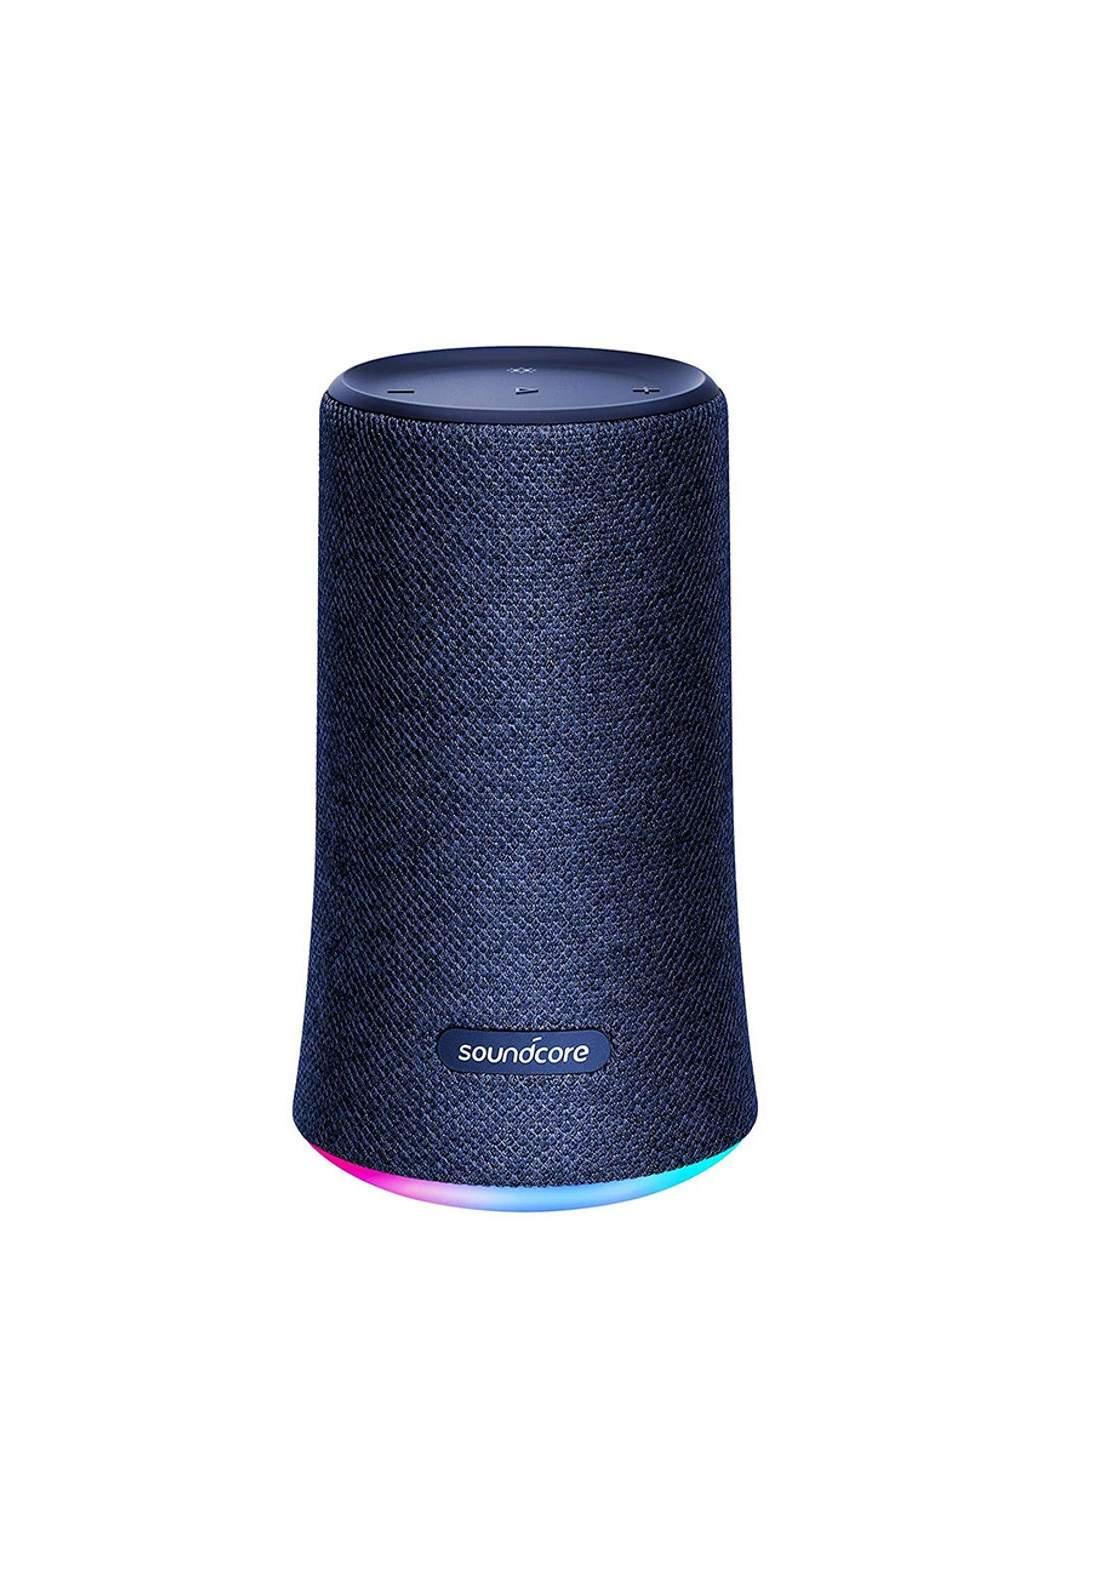 Anker A3161H31 SoundCore Flare Water-Resistant Portable Wireless Bluetooth Speaker - Blue سبيكر (848061053210)